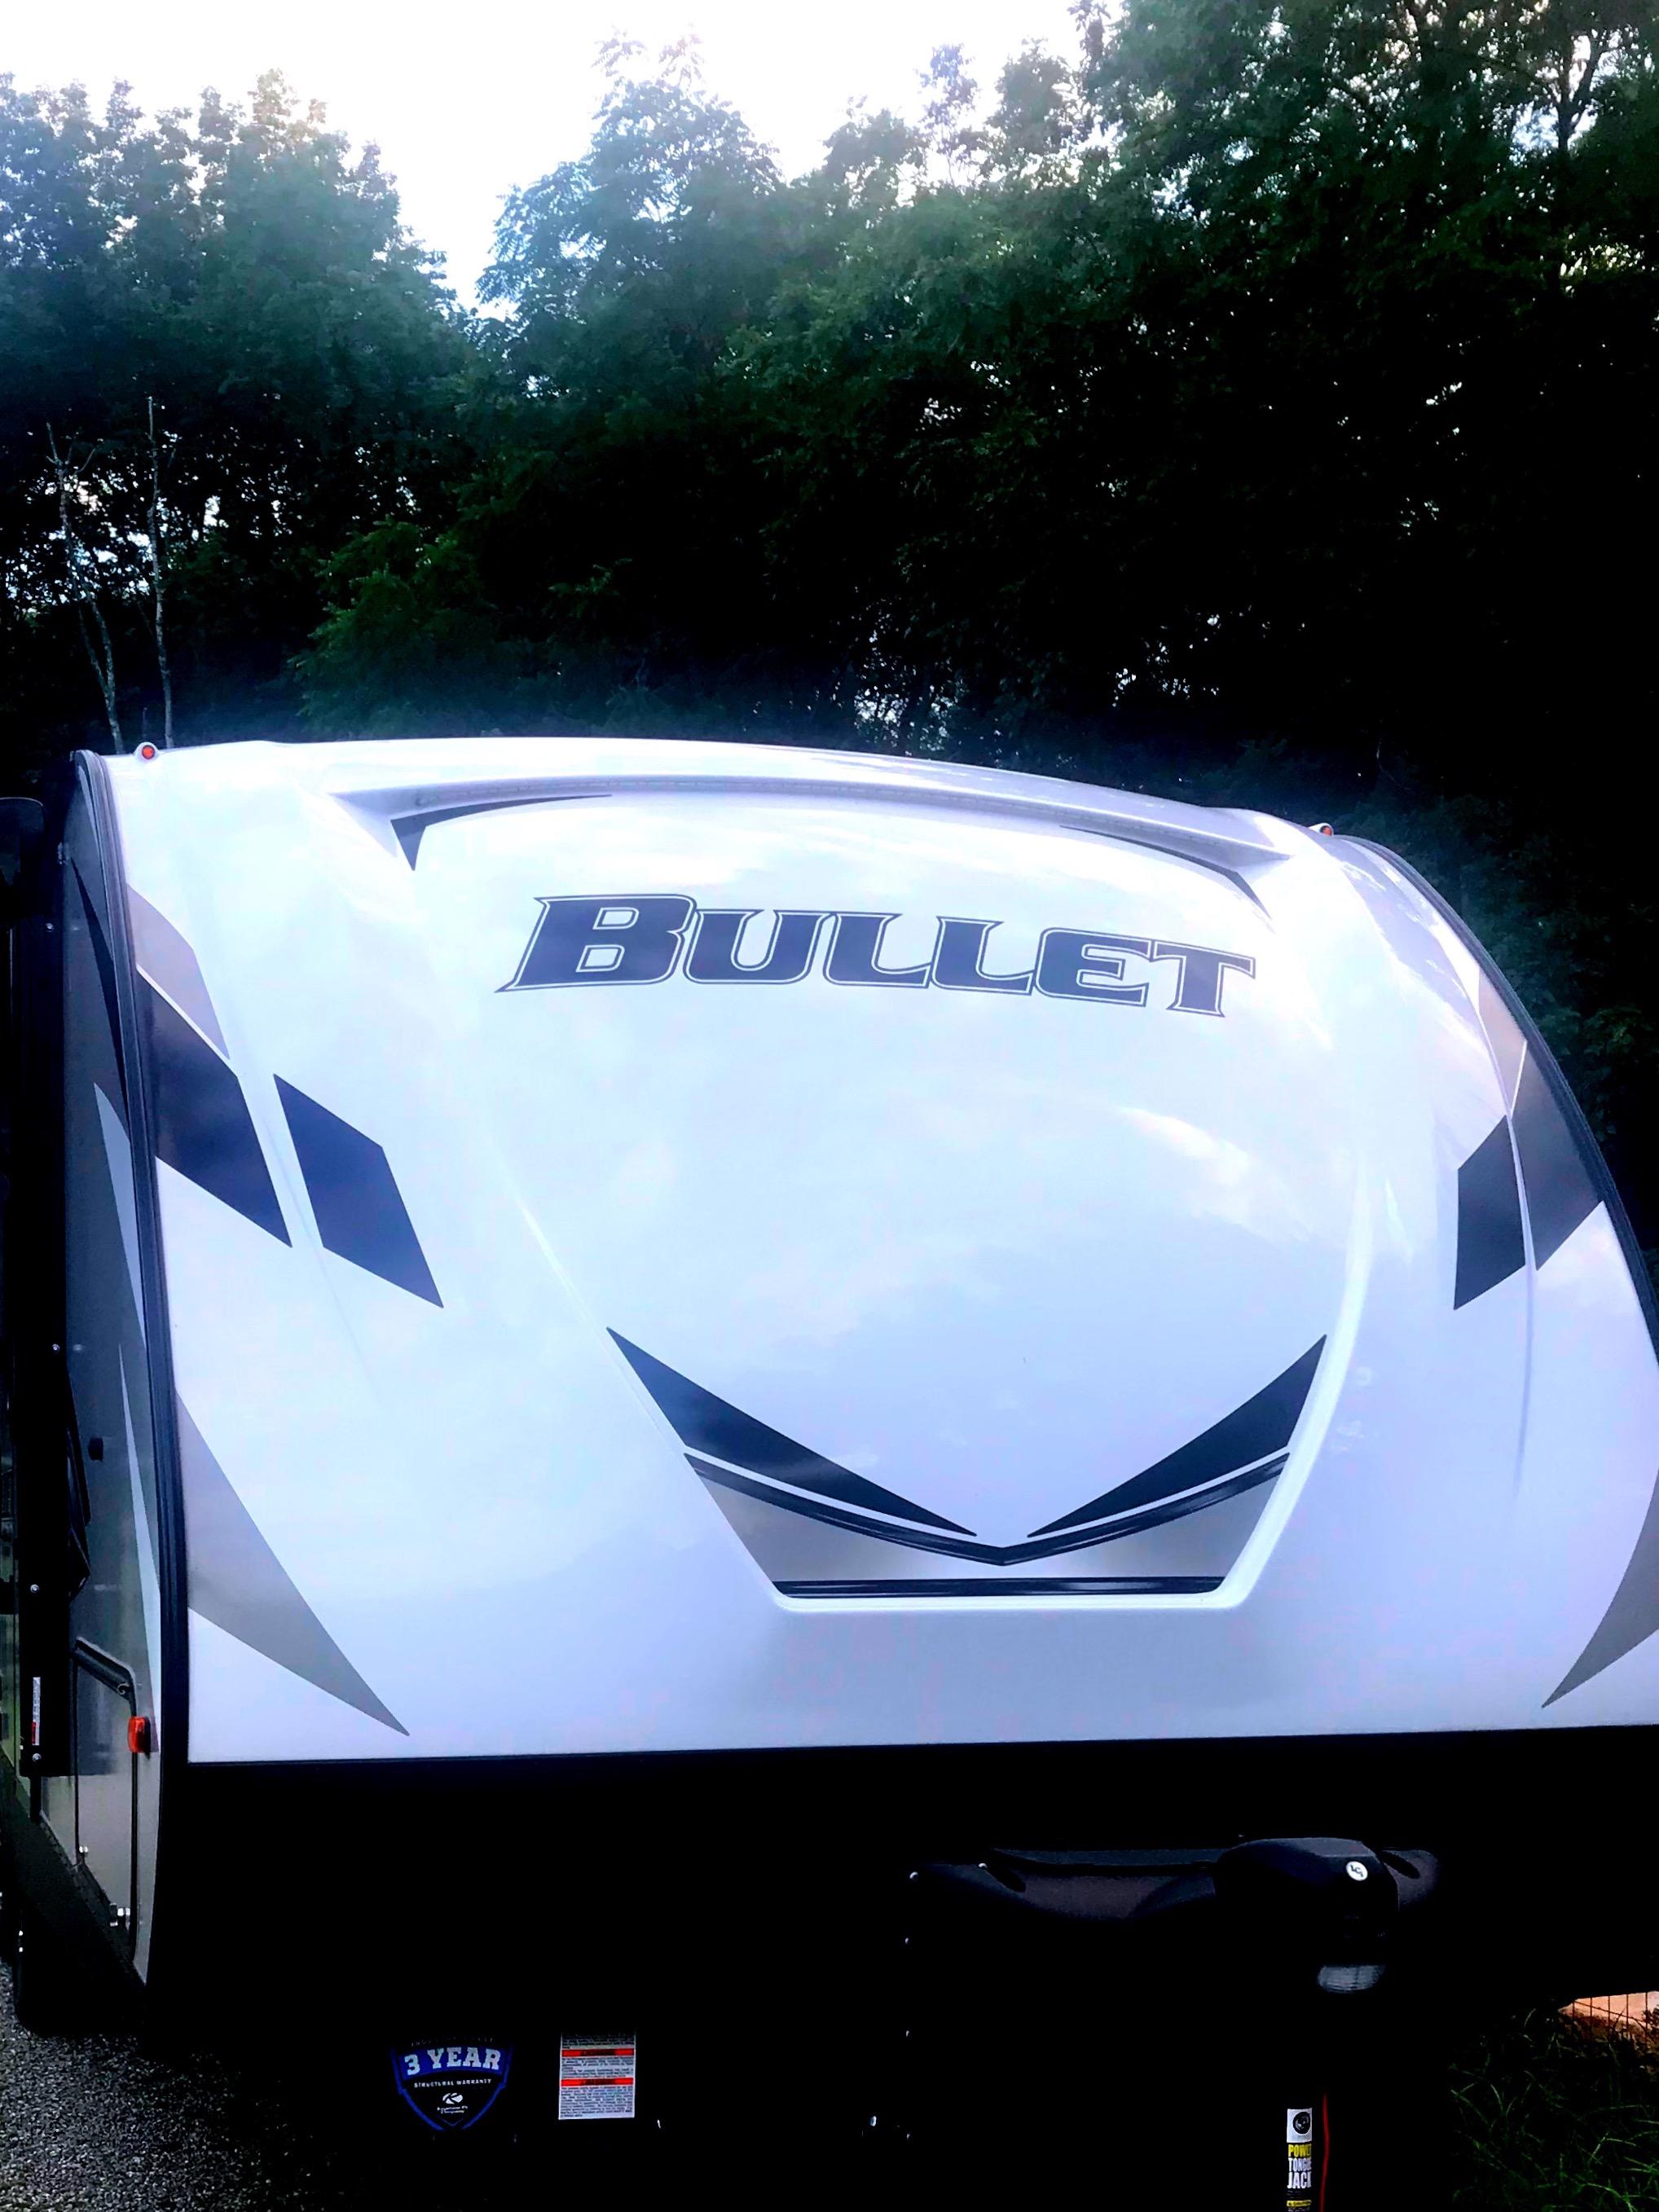 Bullet BHS 243 2021